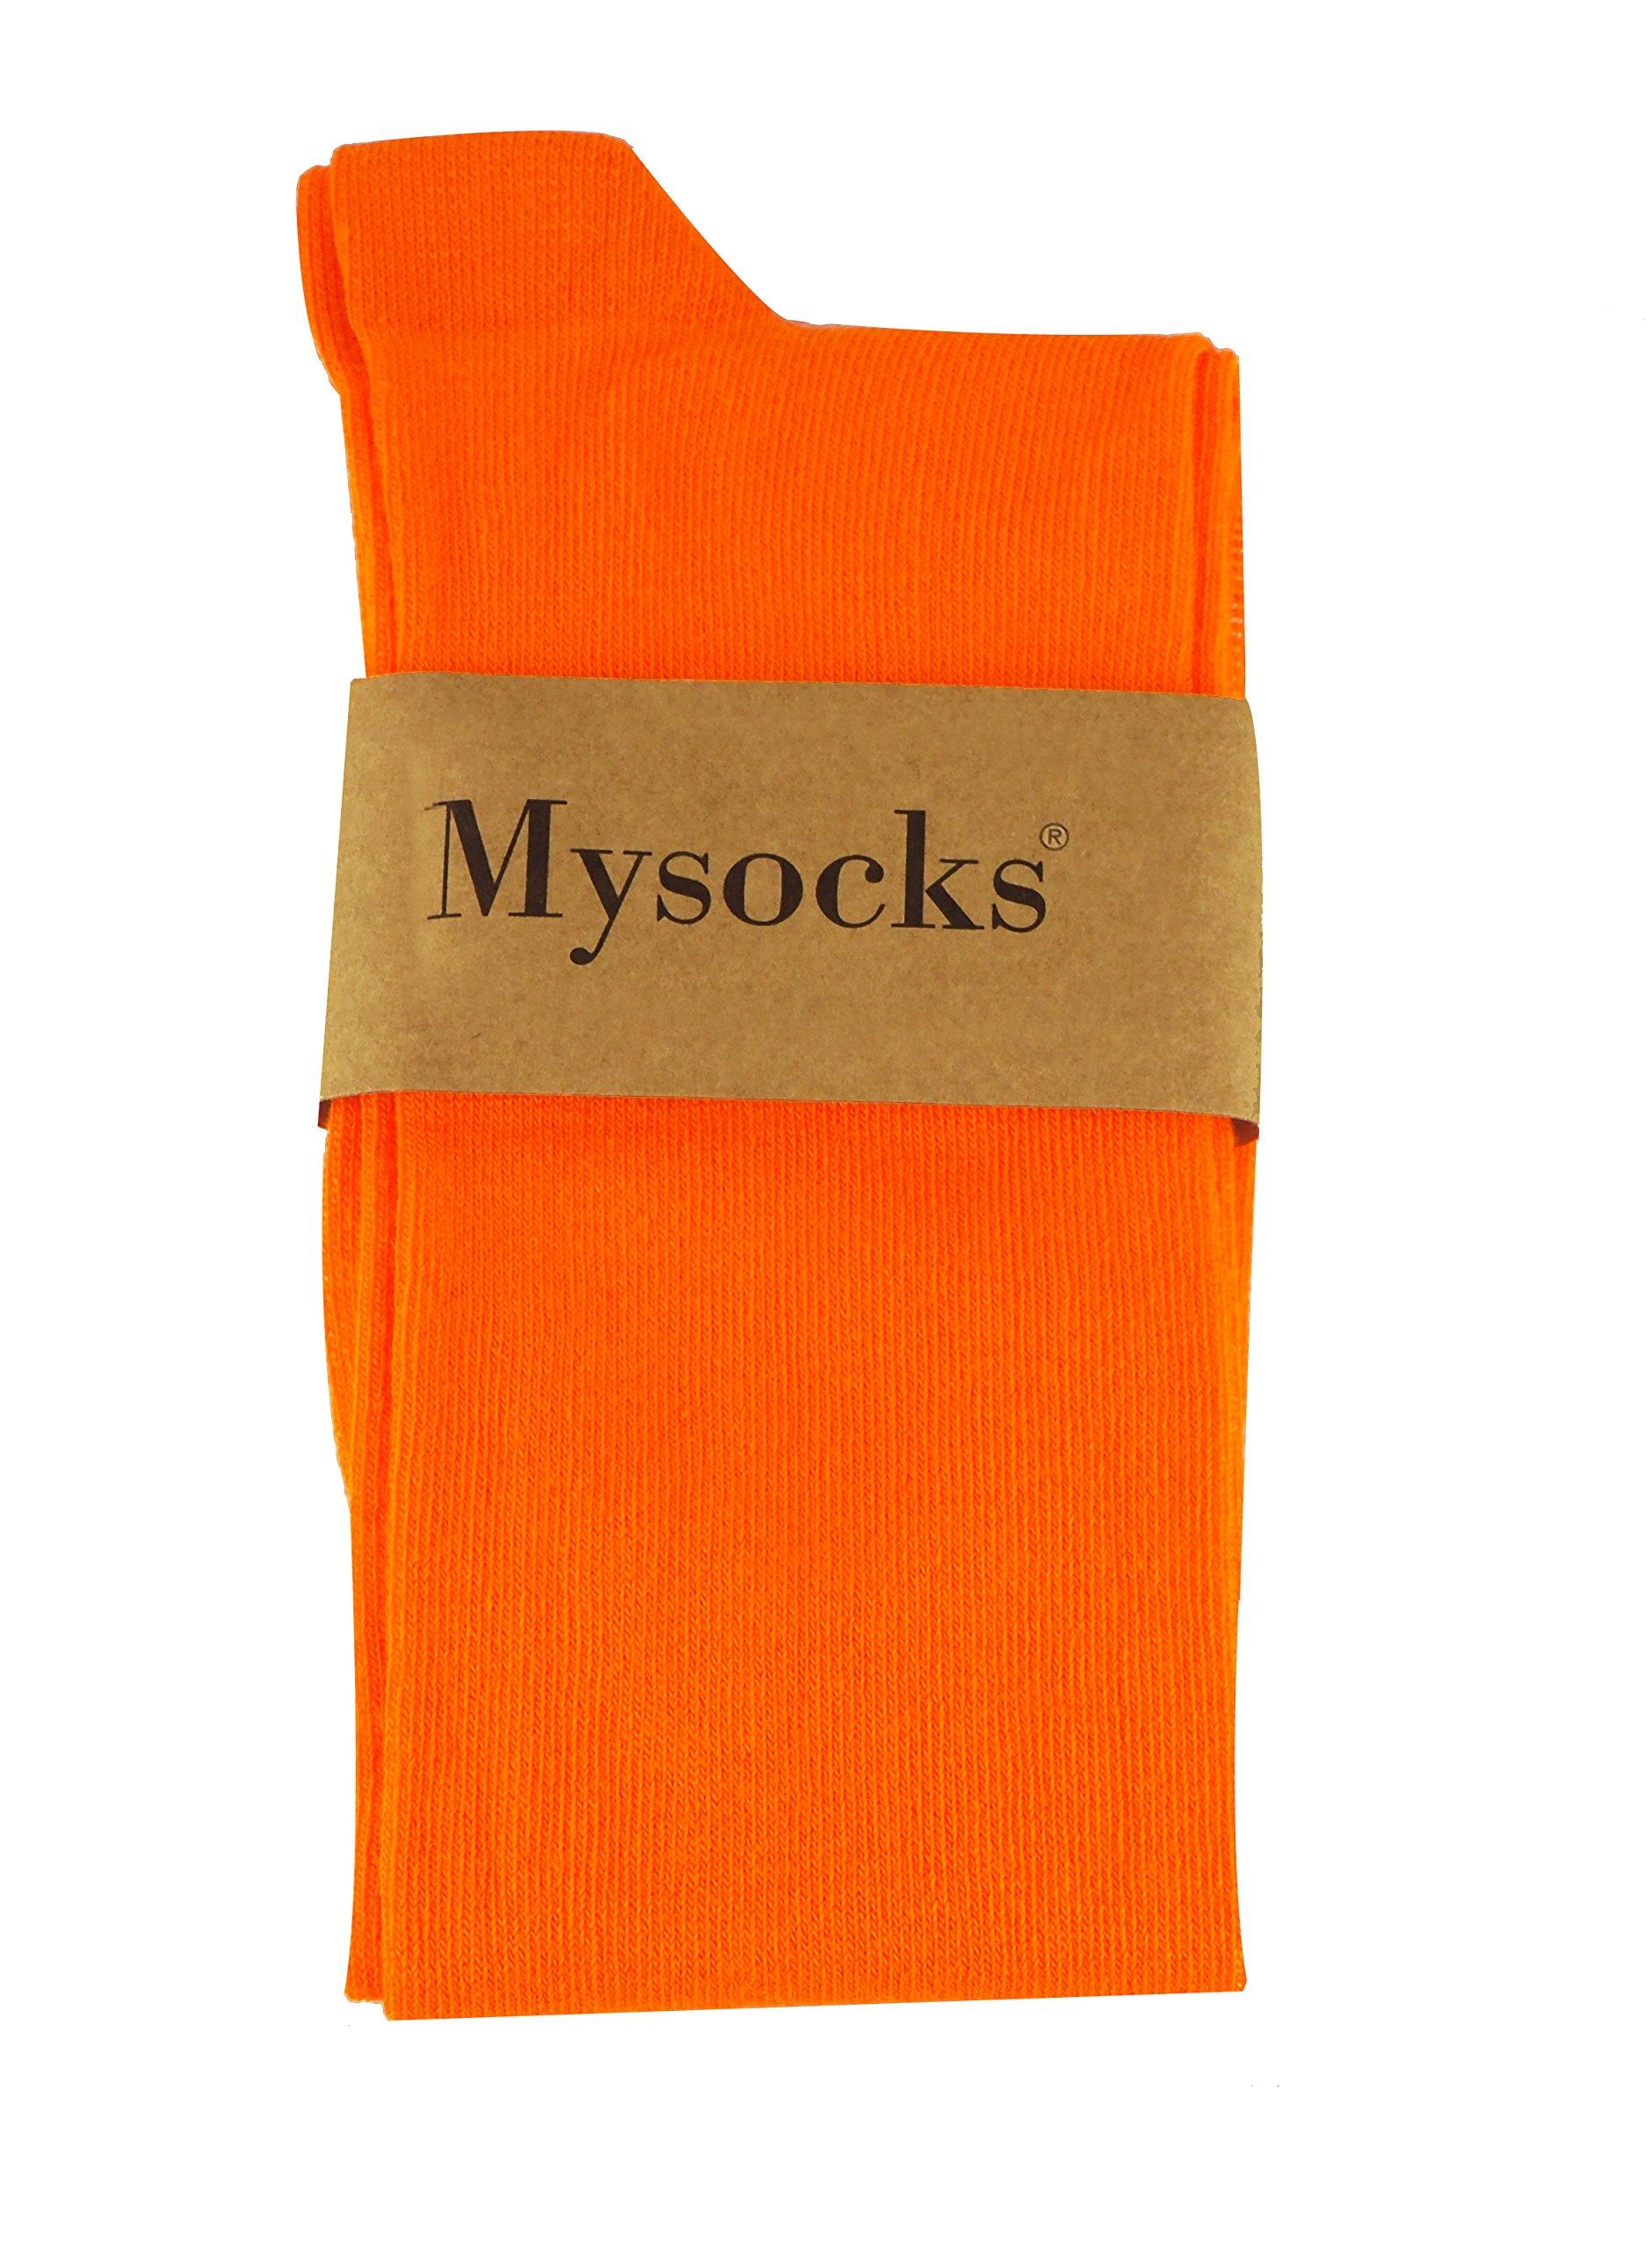 Mysocks Unisex Knee High Long Socks Orange,4-7 by MySocks (Image #7)